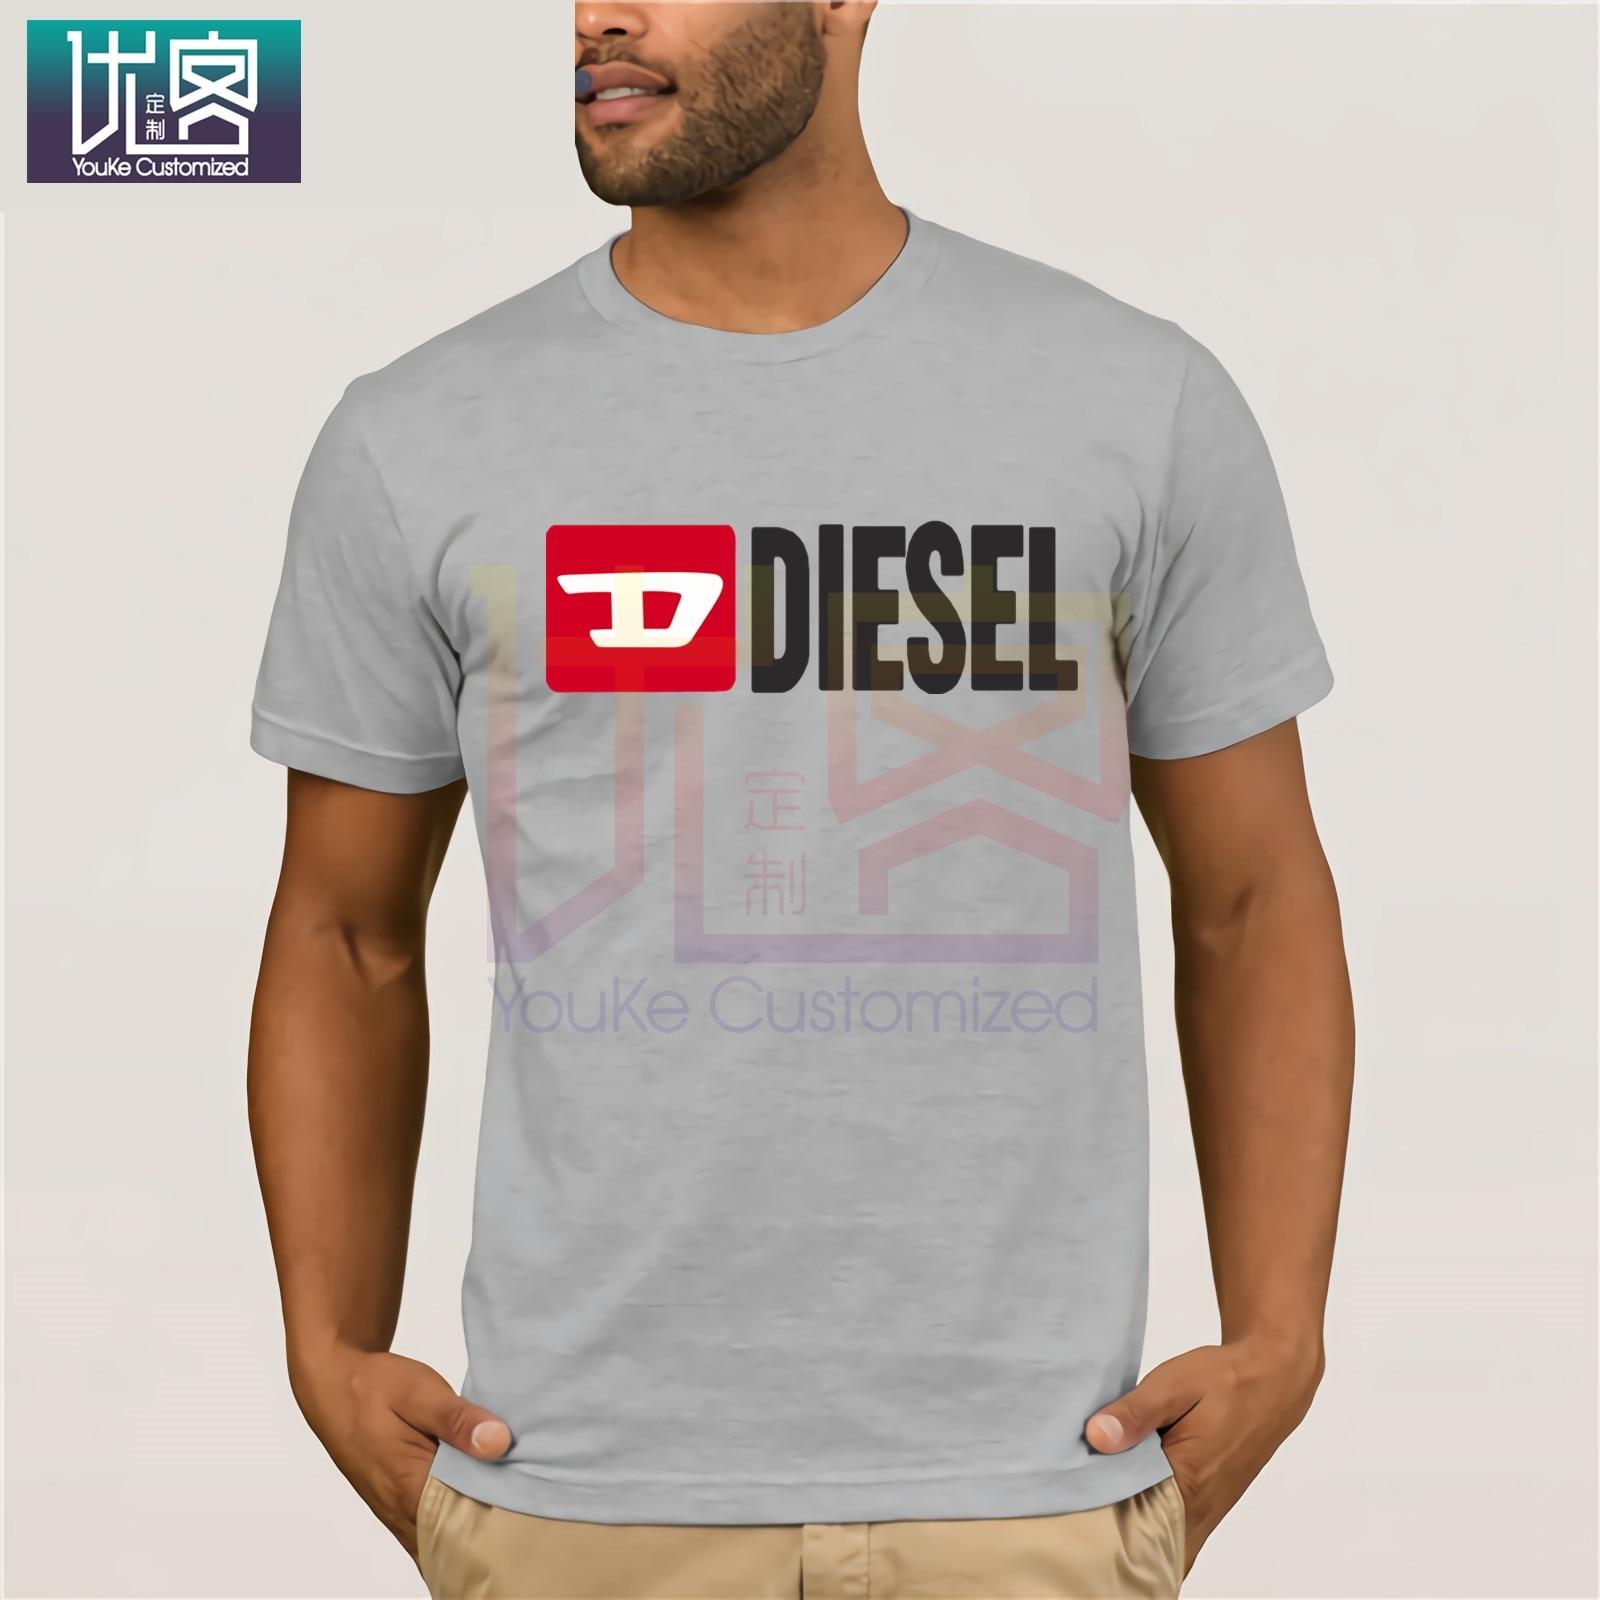 2019 Fashion Men-s-addidas-stone-island-fanatic-diesel-t-shirt-Custom-diesel-O-Neck-Normal-Sunlight-Building-Summer-Style